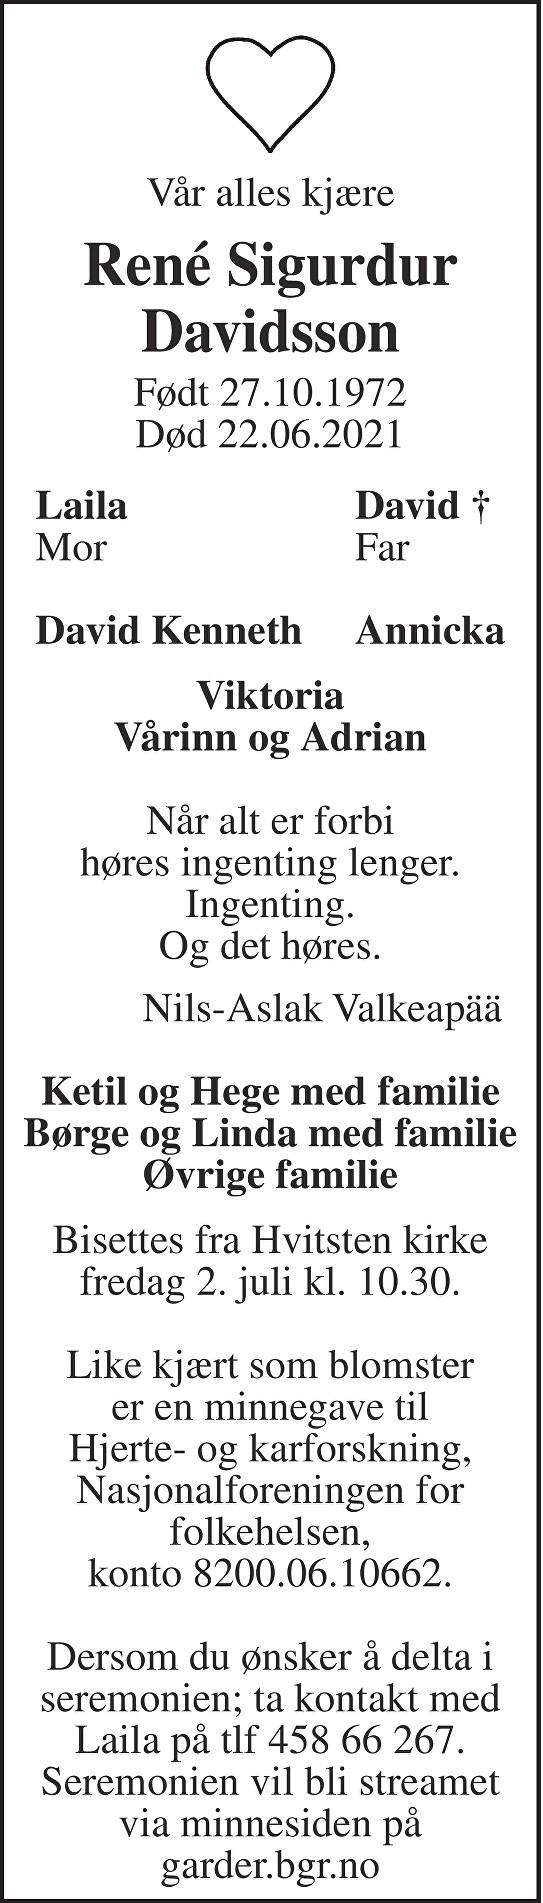 René Sigurdur Davidsson Dødsannonse